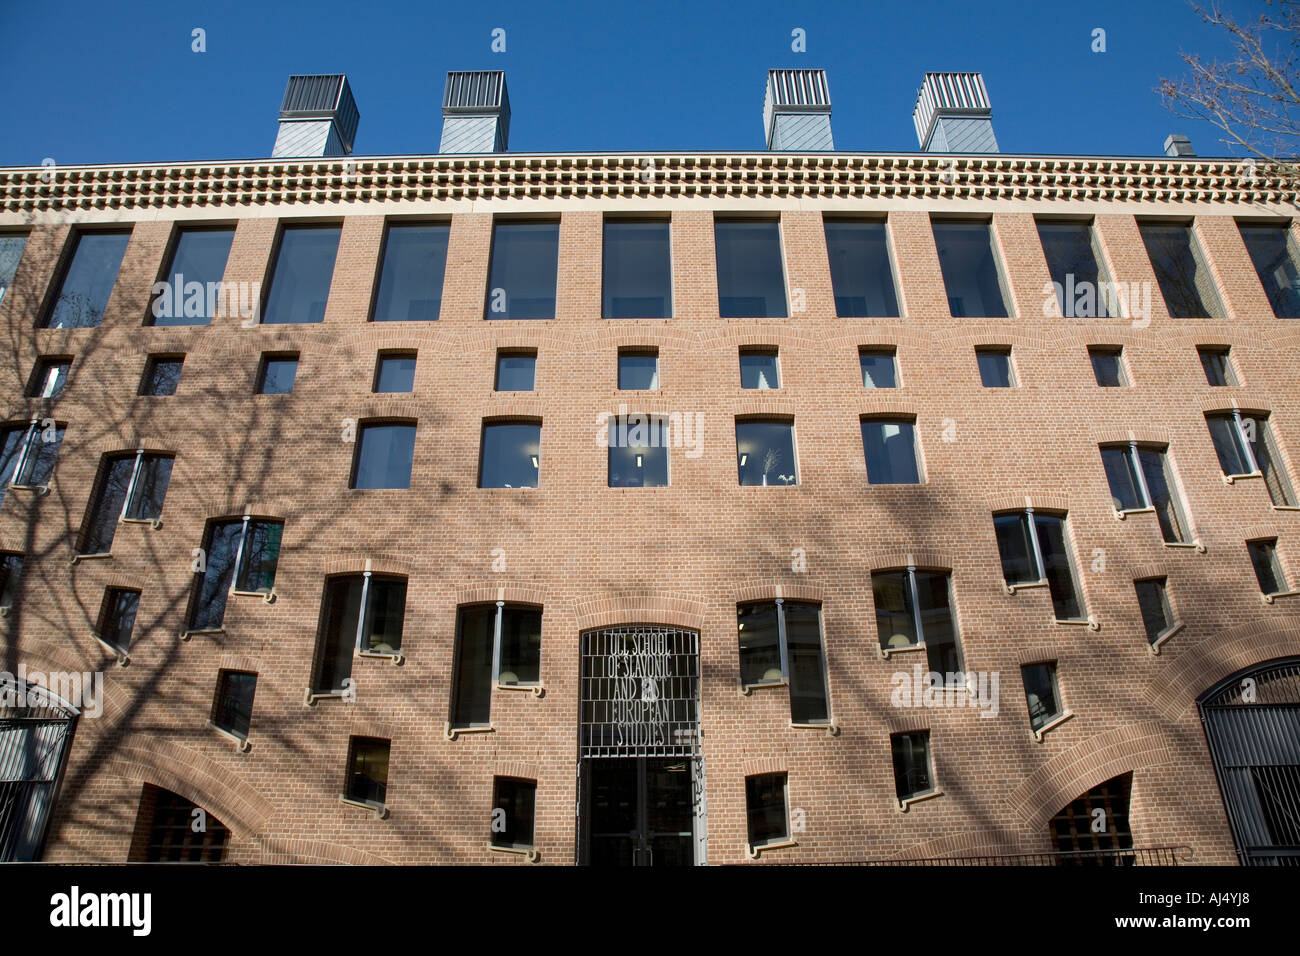 UCL School of Slavonic and East European Studies Taviton Street London England - Stock Image